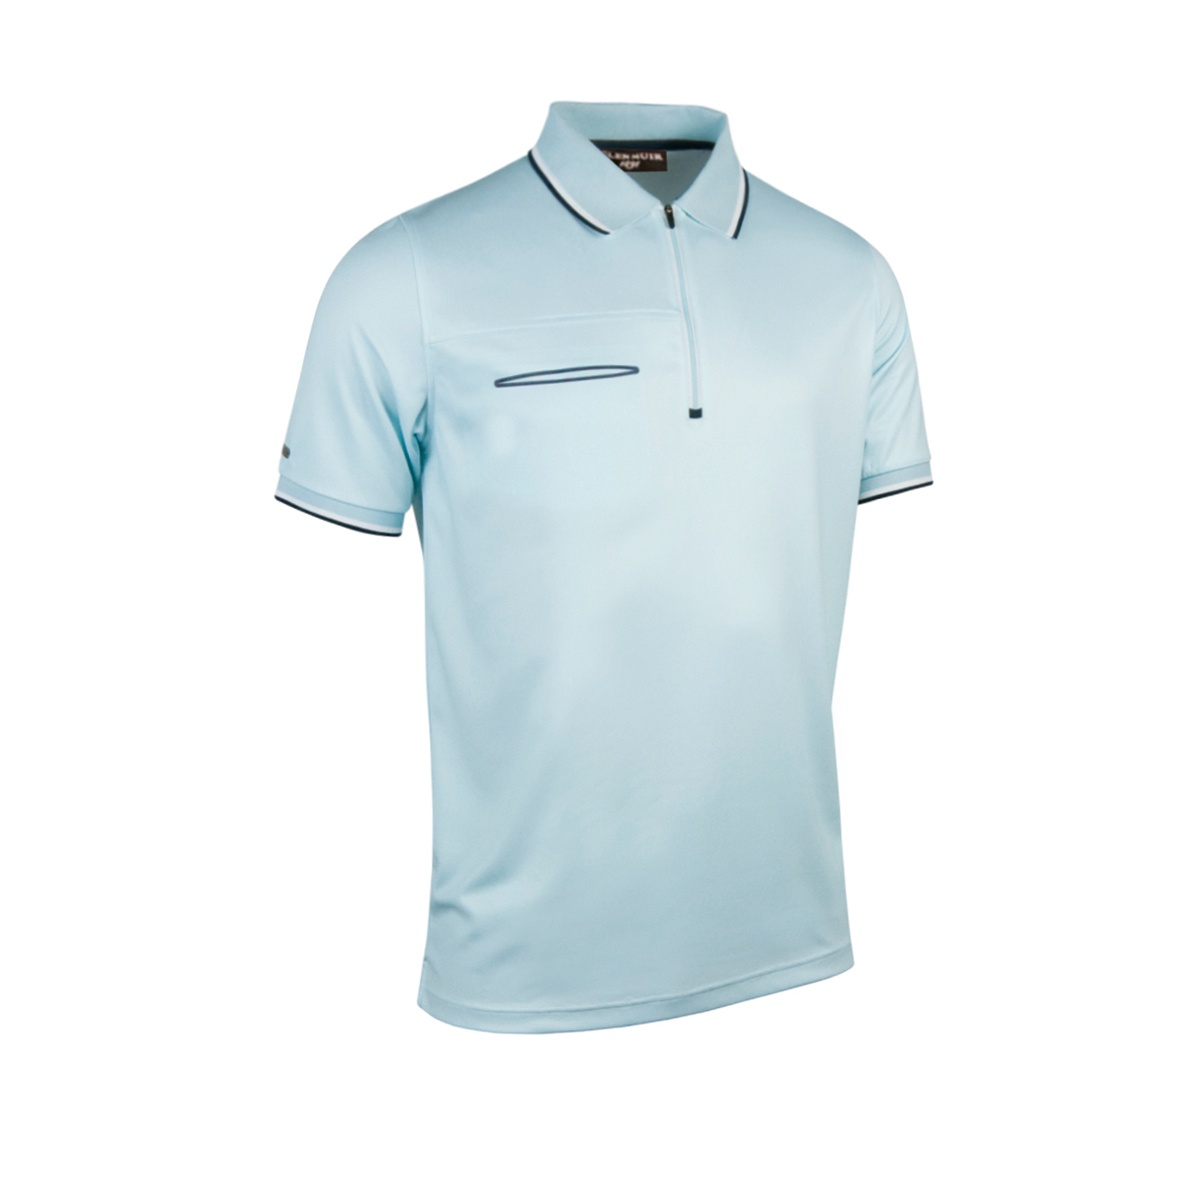 Glenmuir mens zip neck short sleeve polo shirt with pocket for Short sleeve polo shirt with pocket